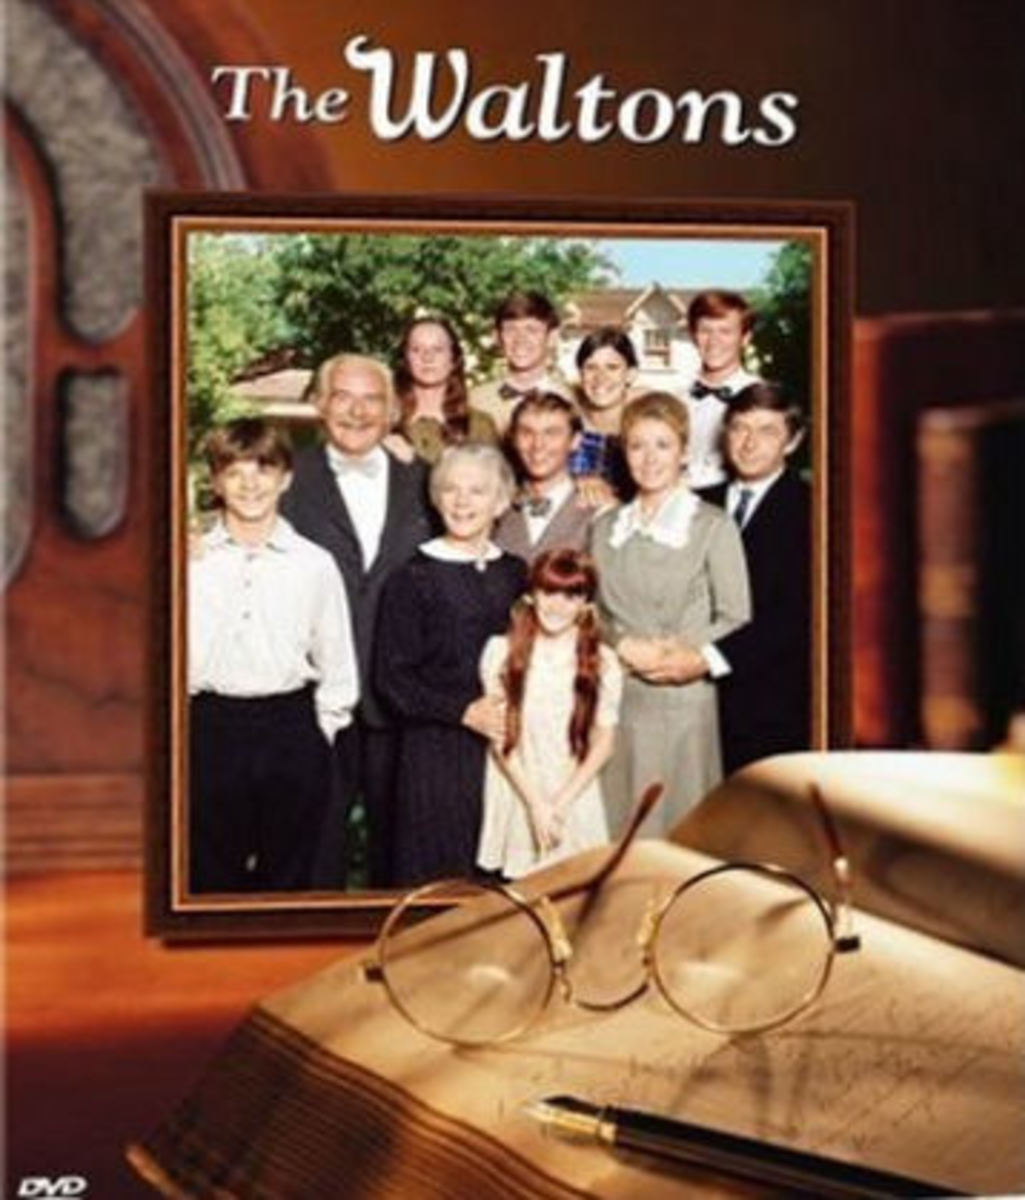 goodnight-john-boy-a-waltons-winter-anniversary